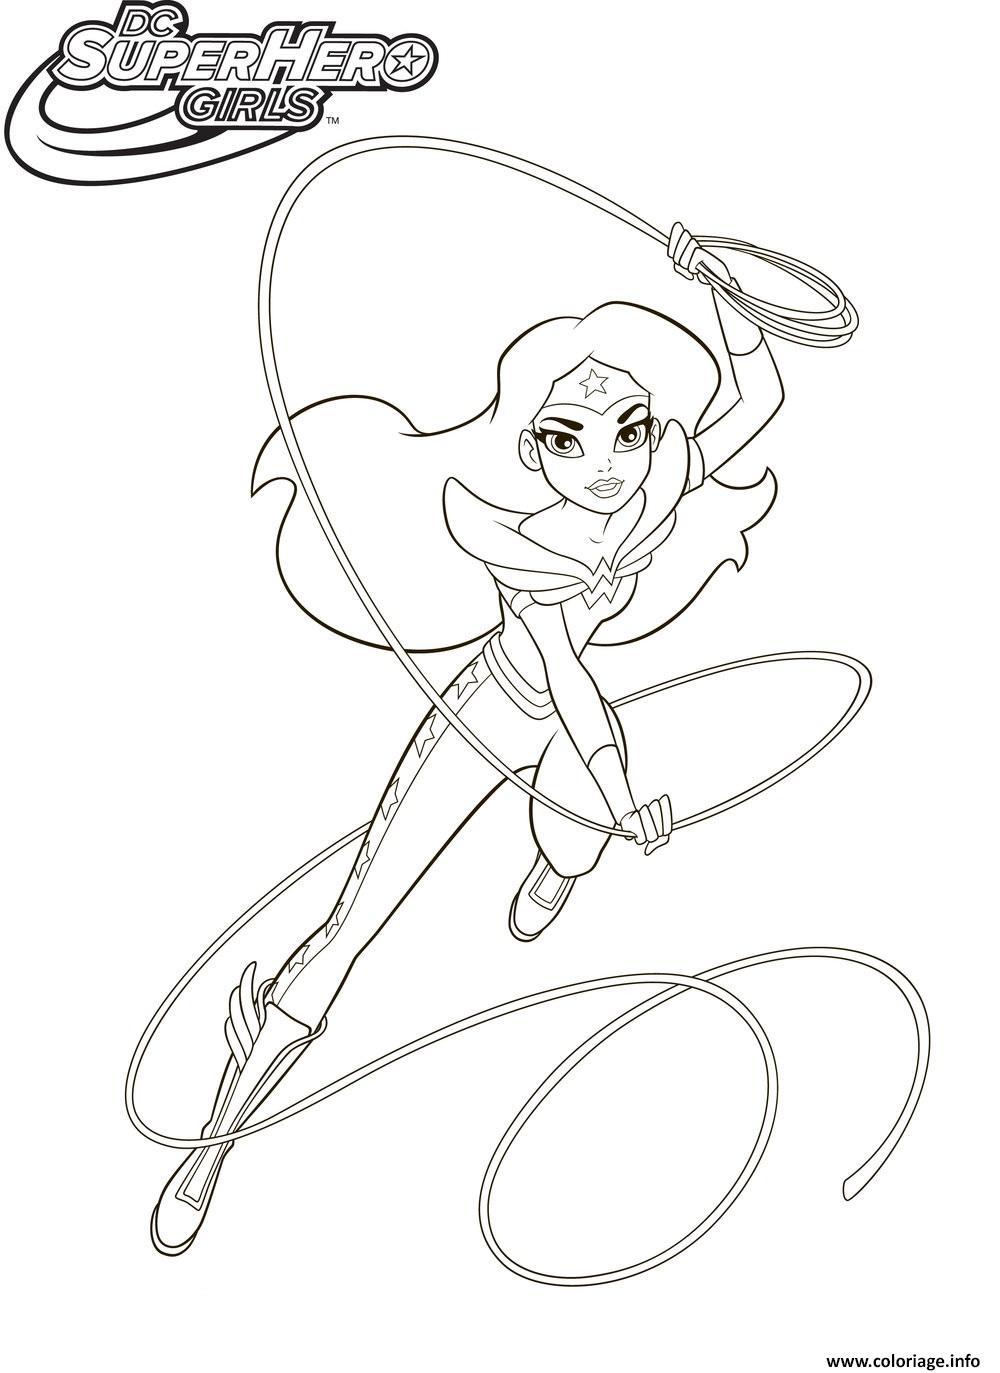 Coloriage Wonderwoman Super Hero Girls Dessin